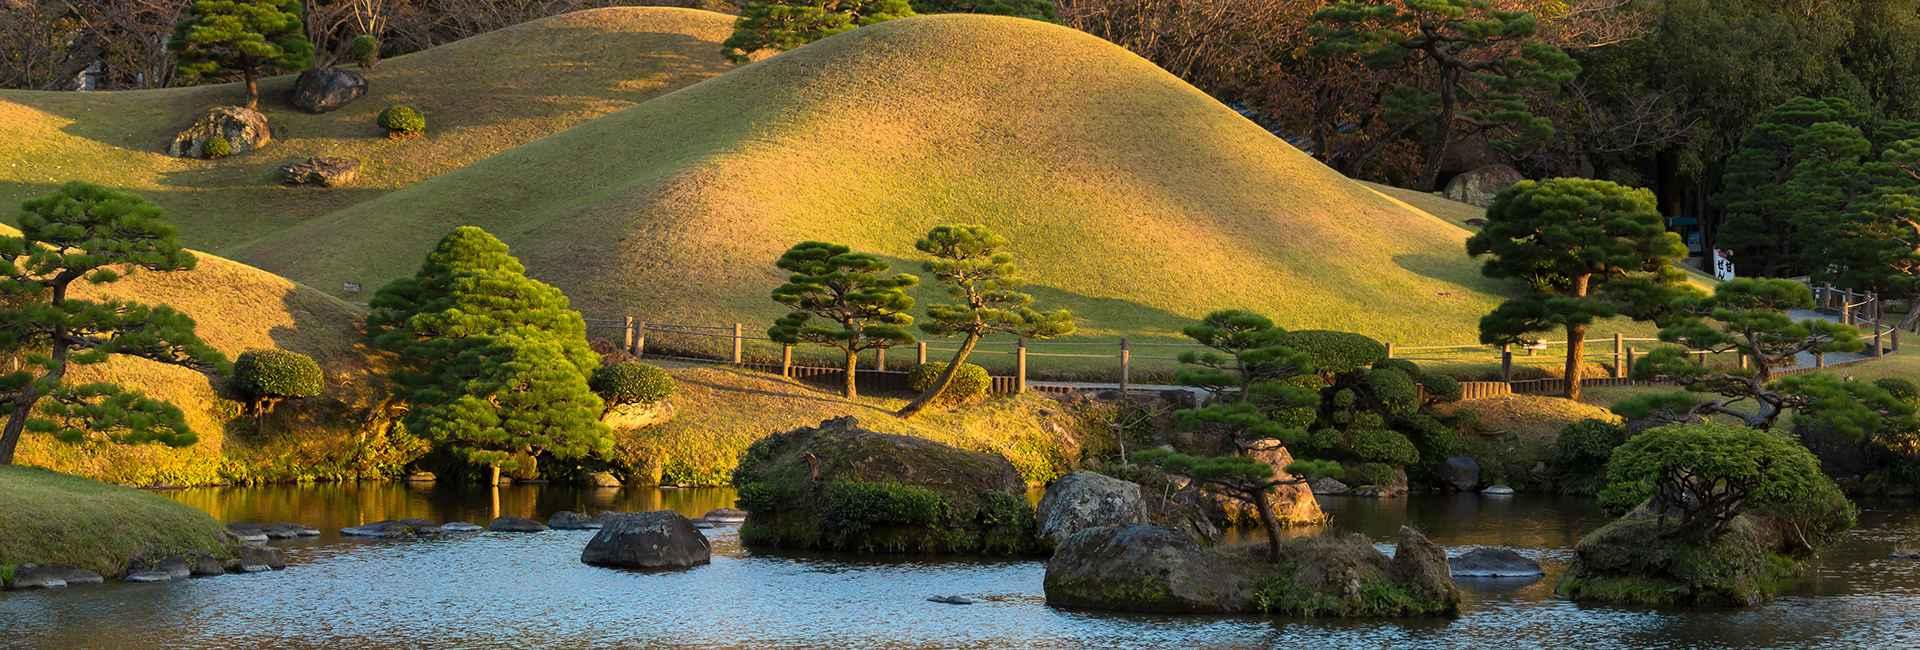 jardin suizen à Kumamoto